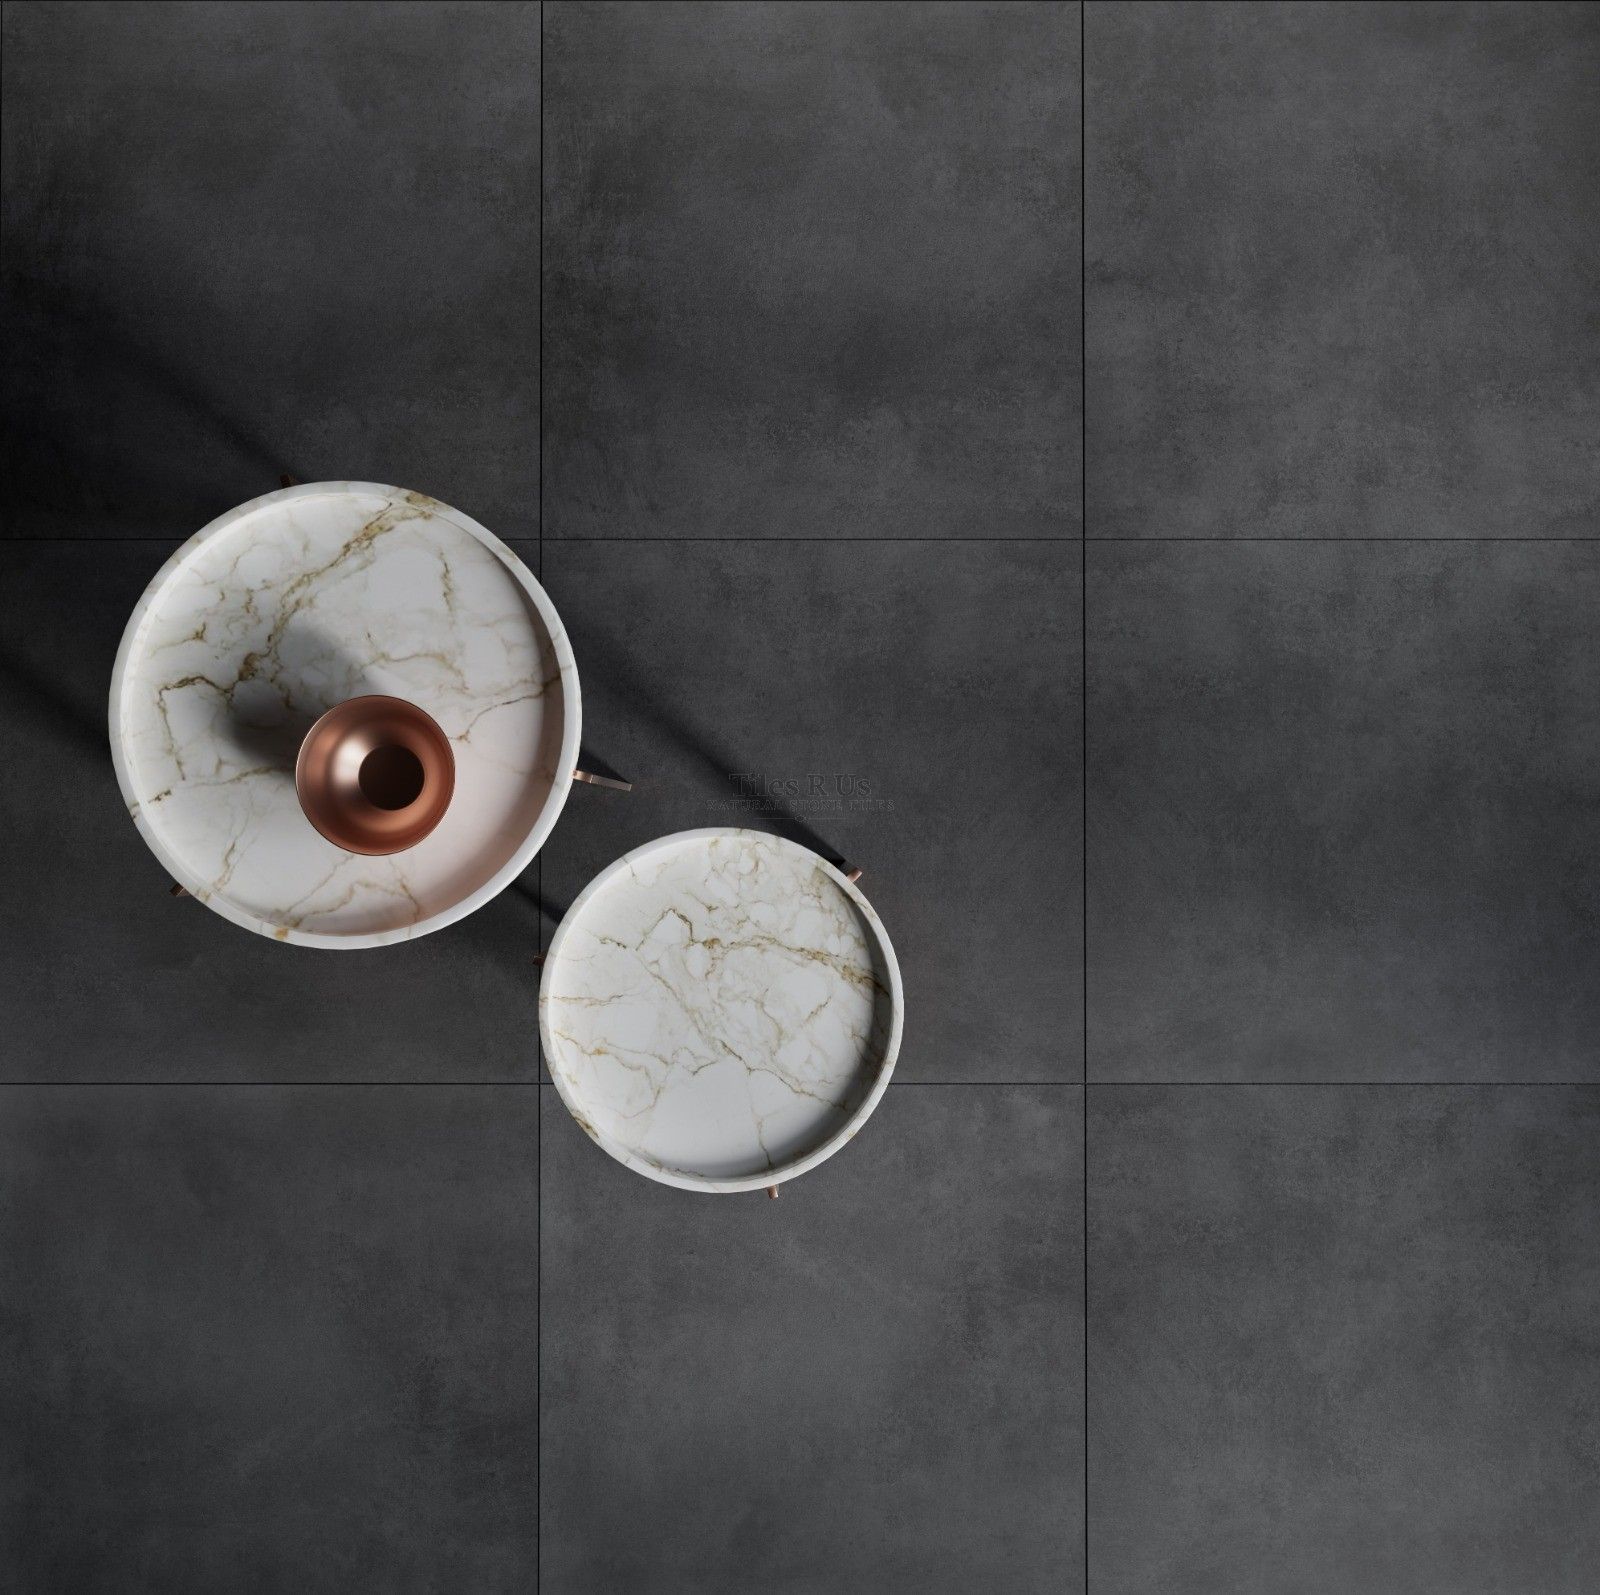 Chaldean Black (Rectified) Matt Porcelain